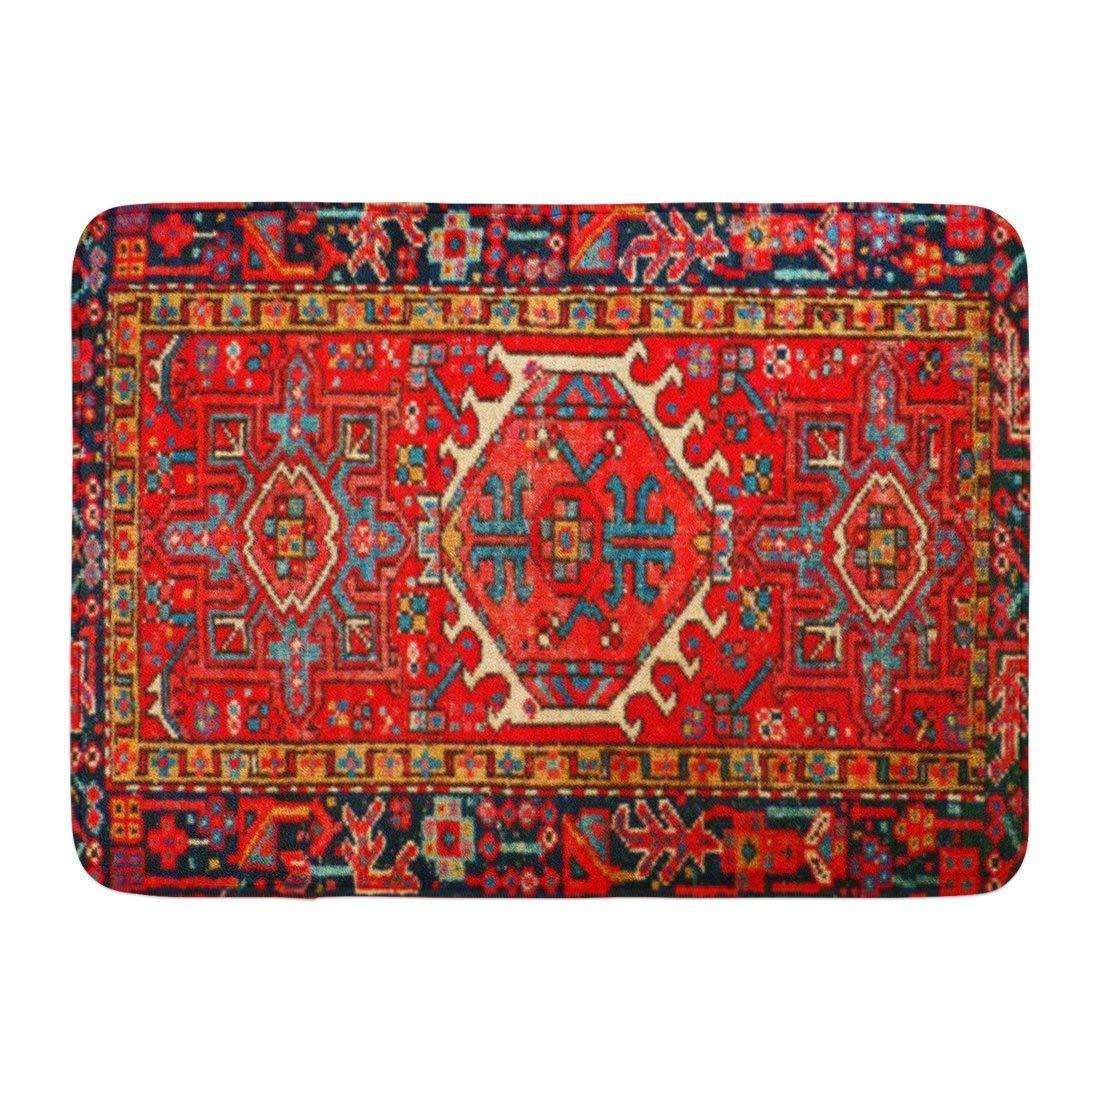 Coolest Secret Bath Mat Iran Persian Carpet Oriental Glam Iranian Ethnic Traditional Tribal Bathroom Decor Rug 16'' x 24''